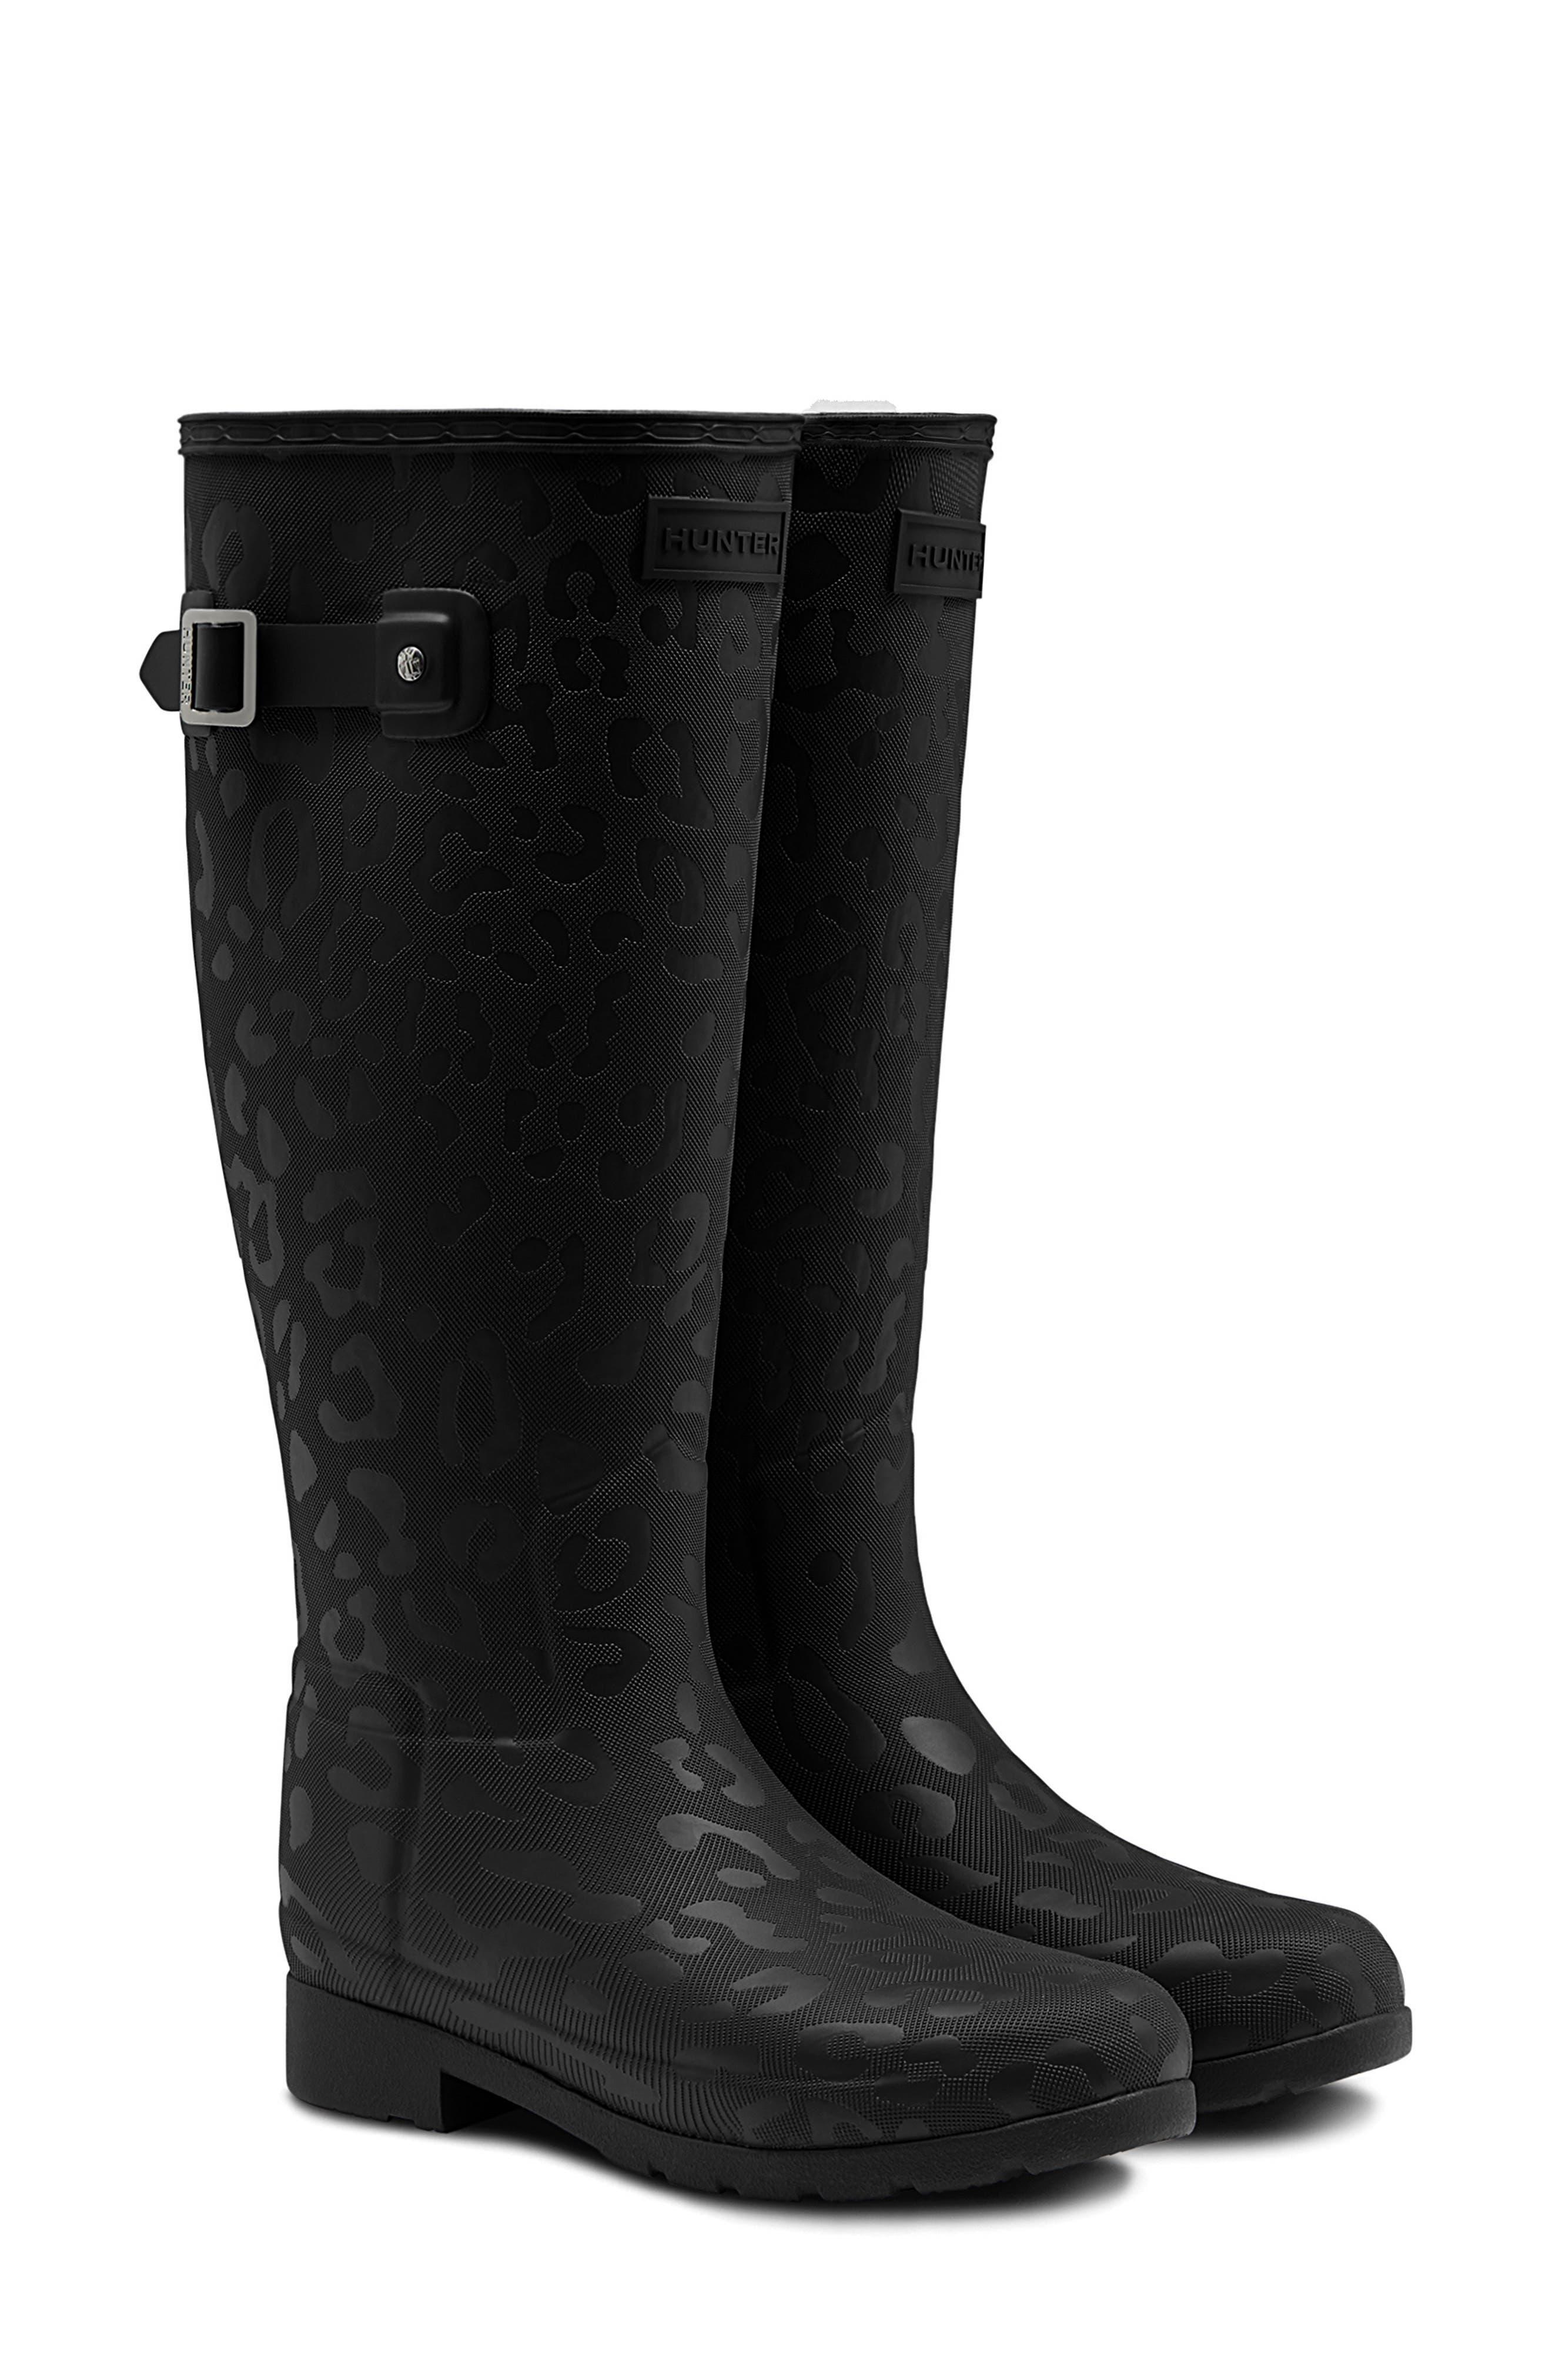 Original Insulated Refined Tall Waterproof Rain Boot,                         Main,                         color, BLACK